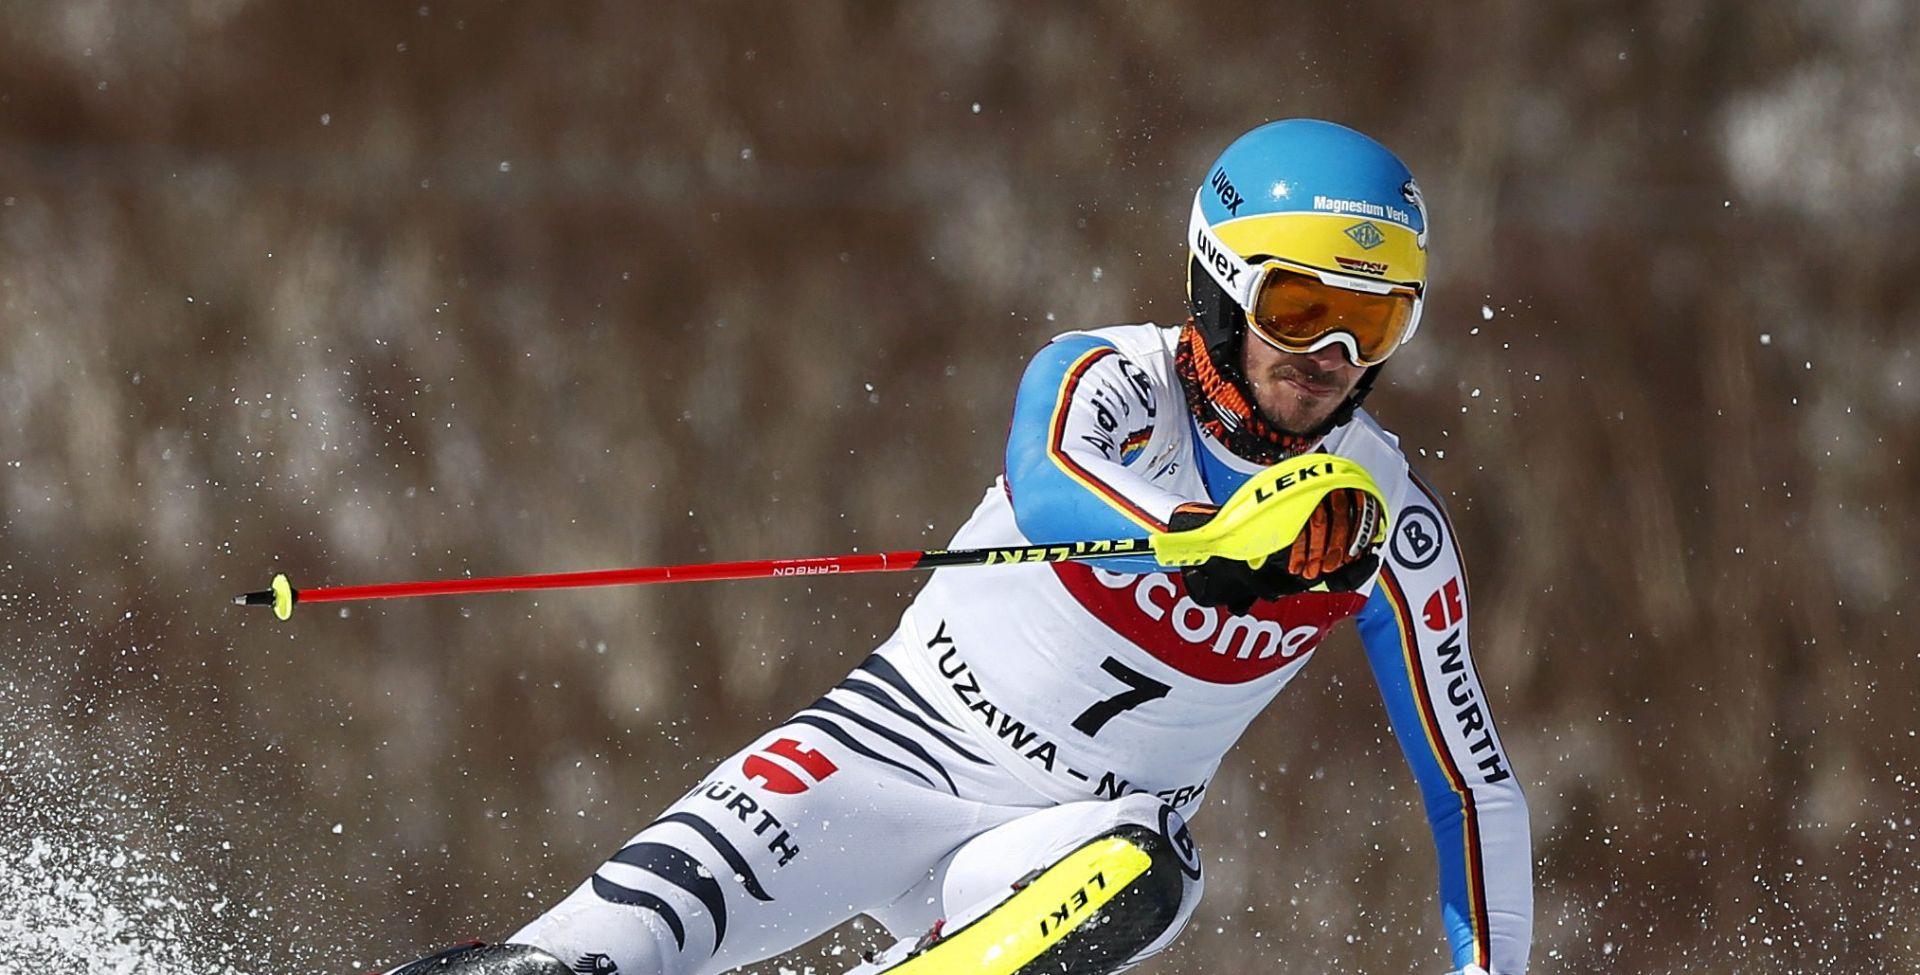 St. Moritz, slalom (m): Rodeš 17. na zadnjem slalomu sezone, pobjeda Myhreru